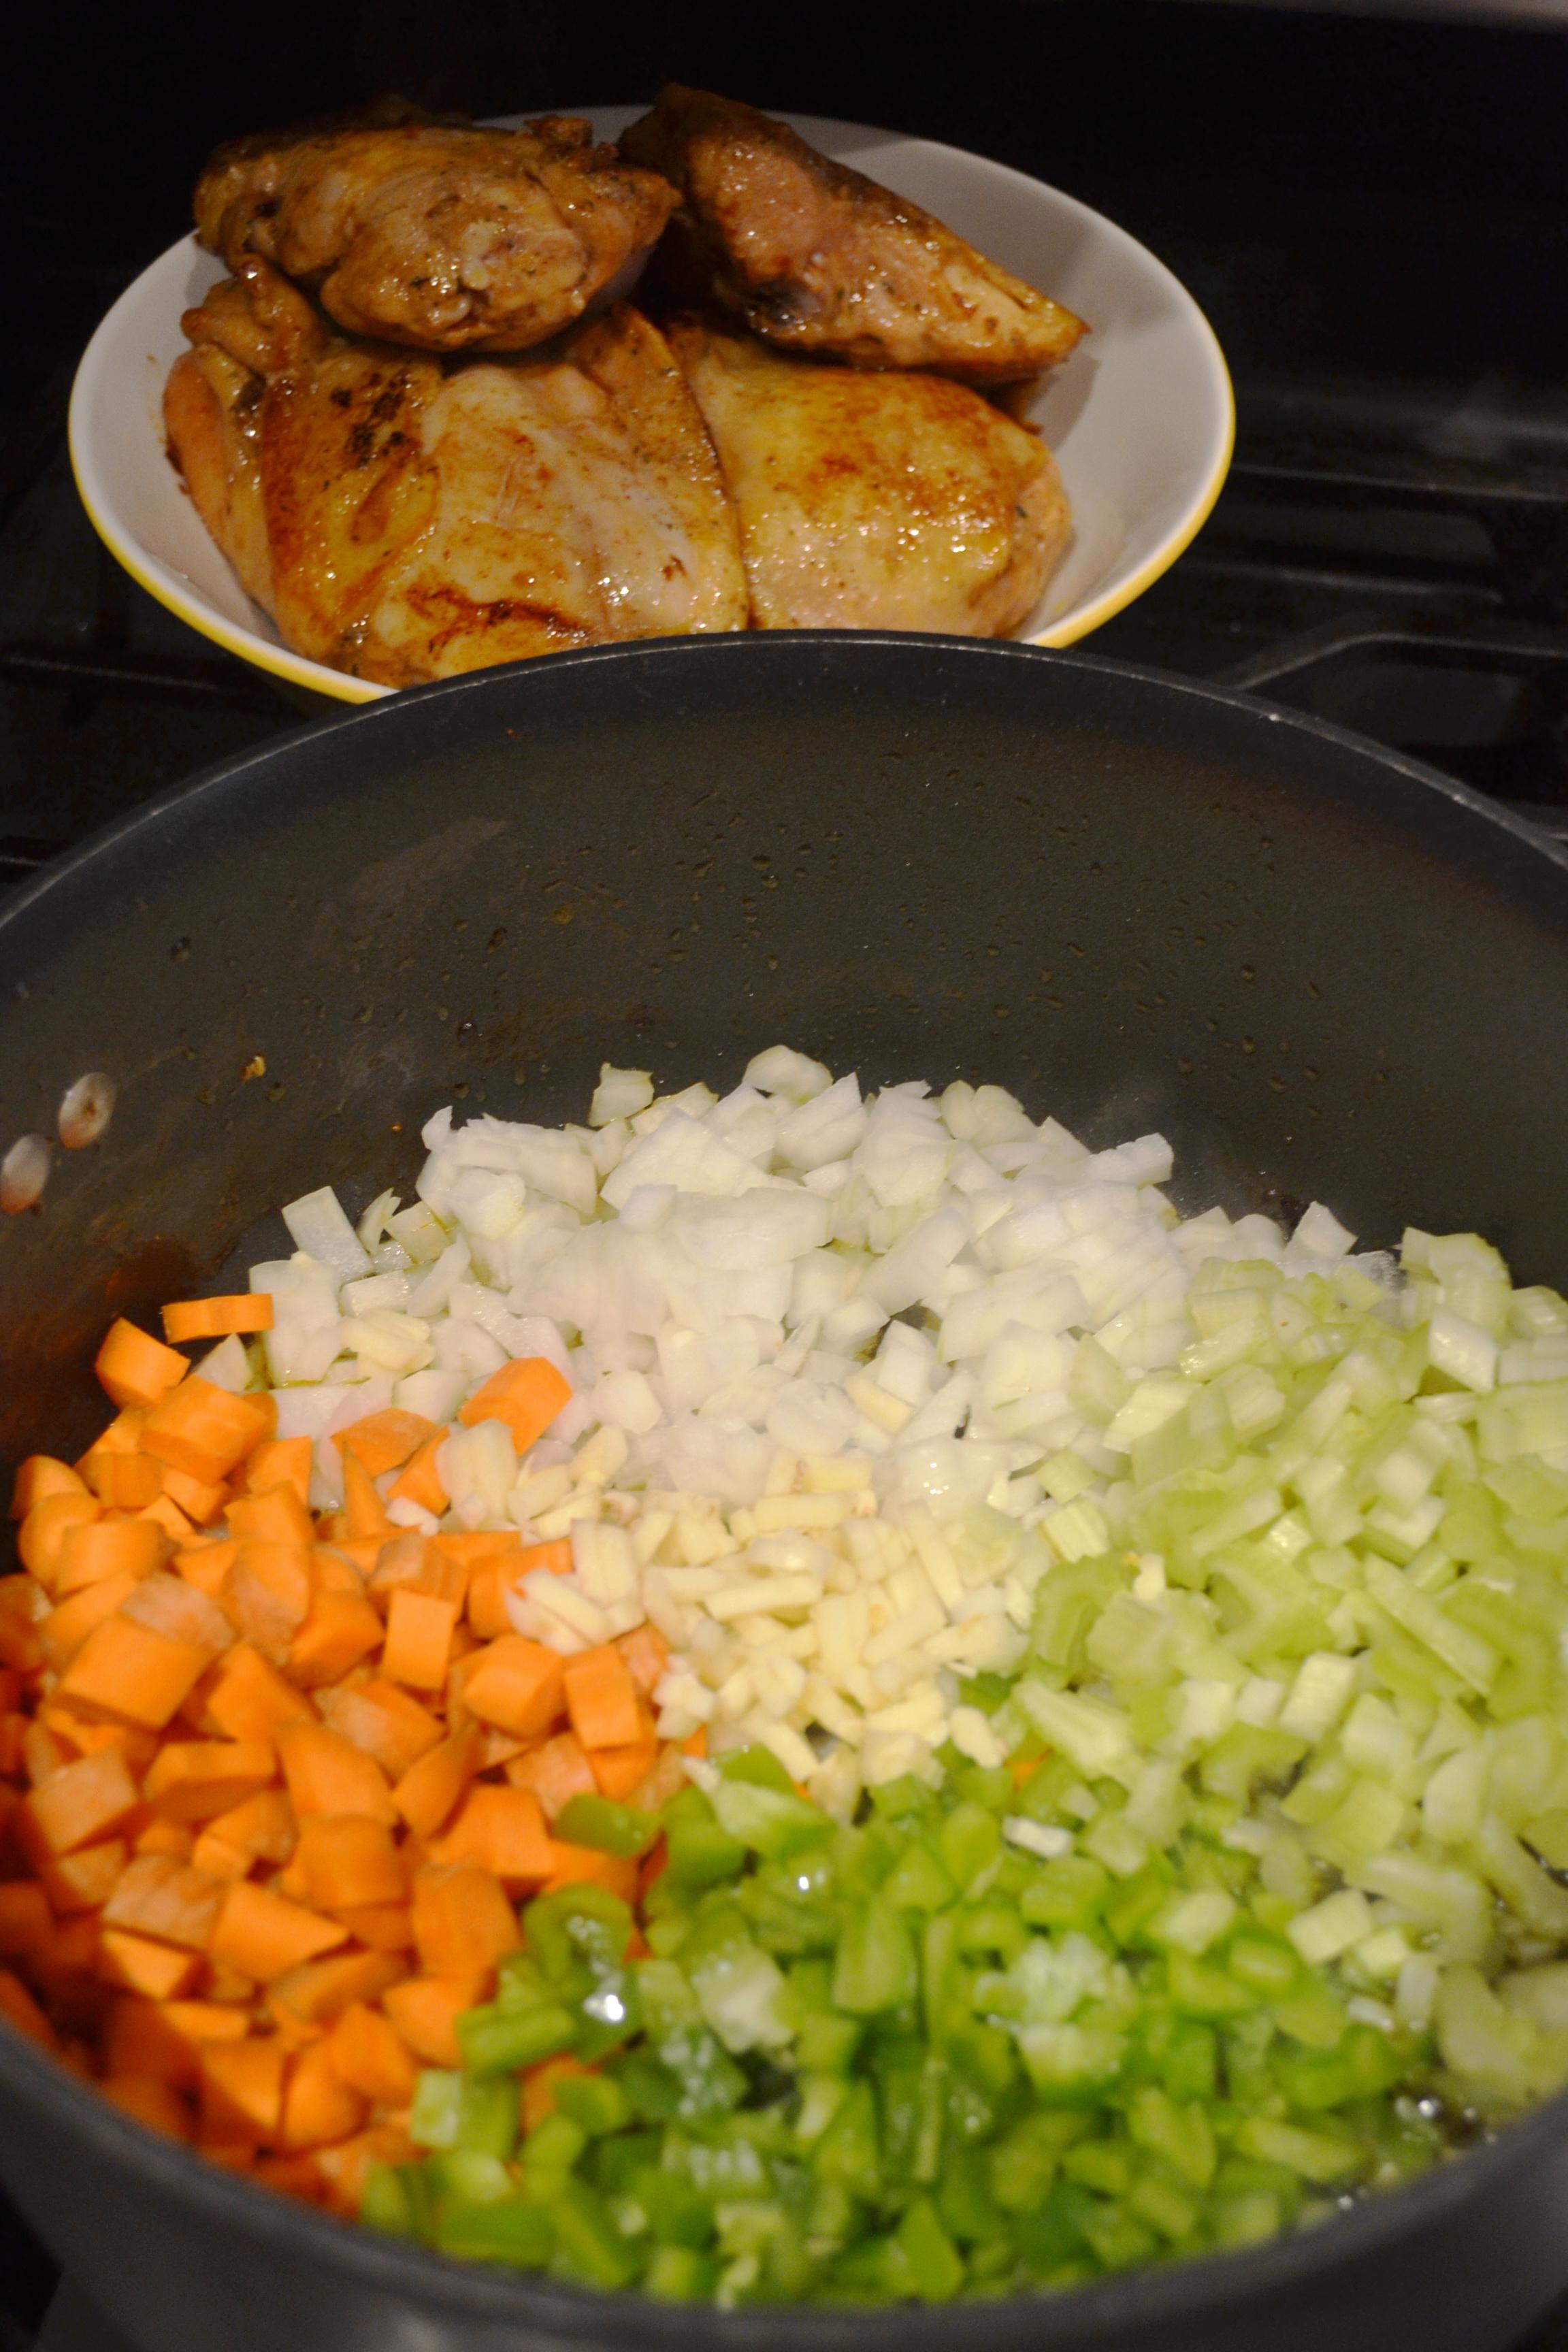 Rumba Meats - Sauteing